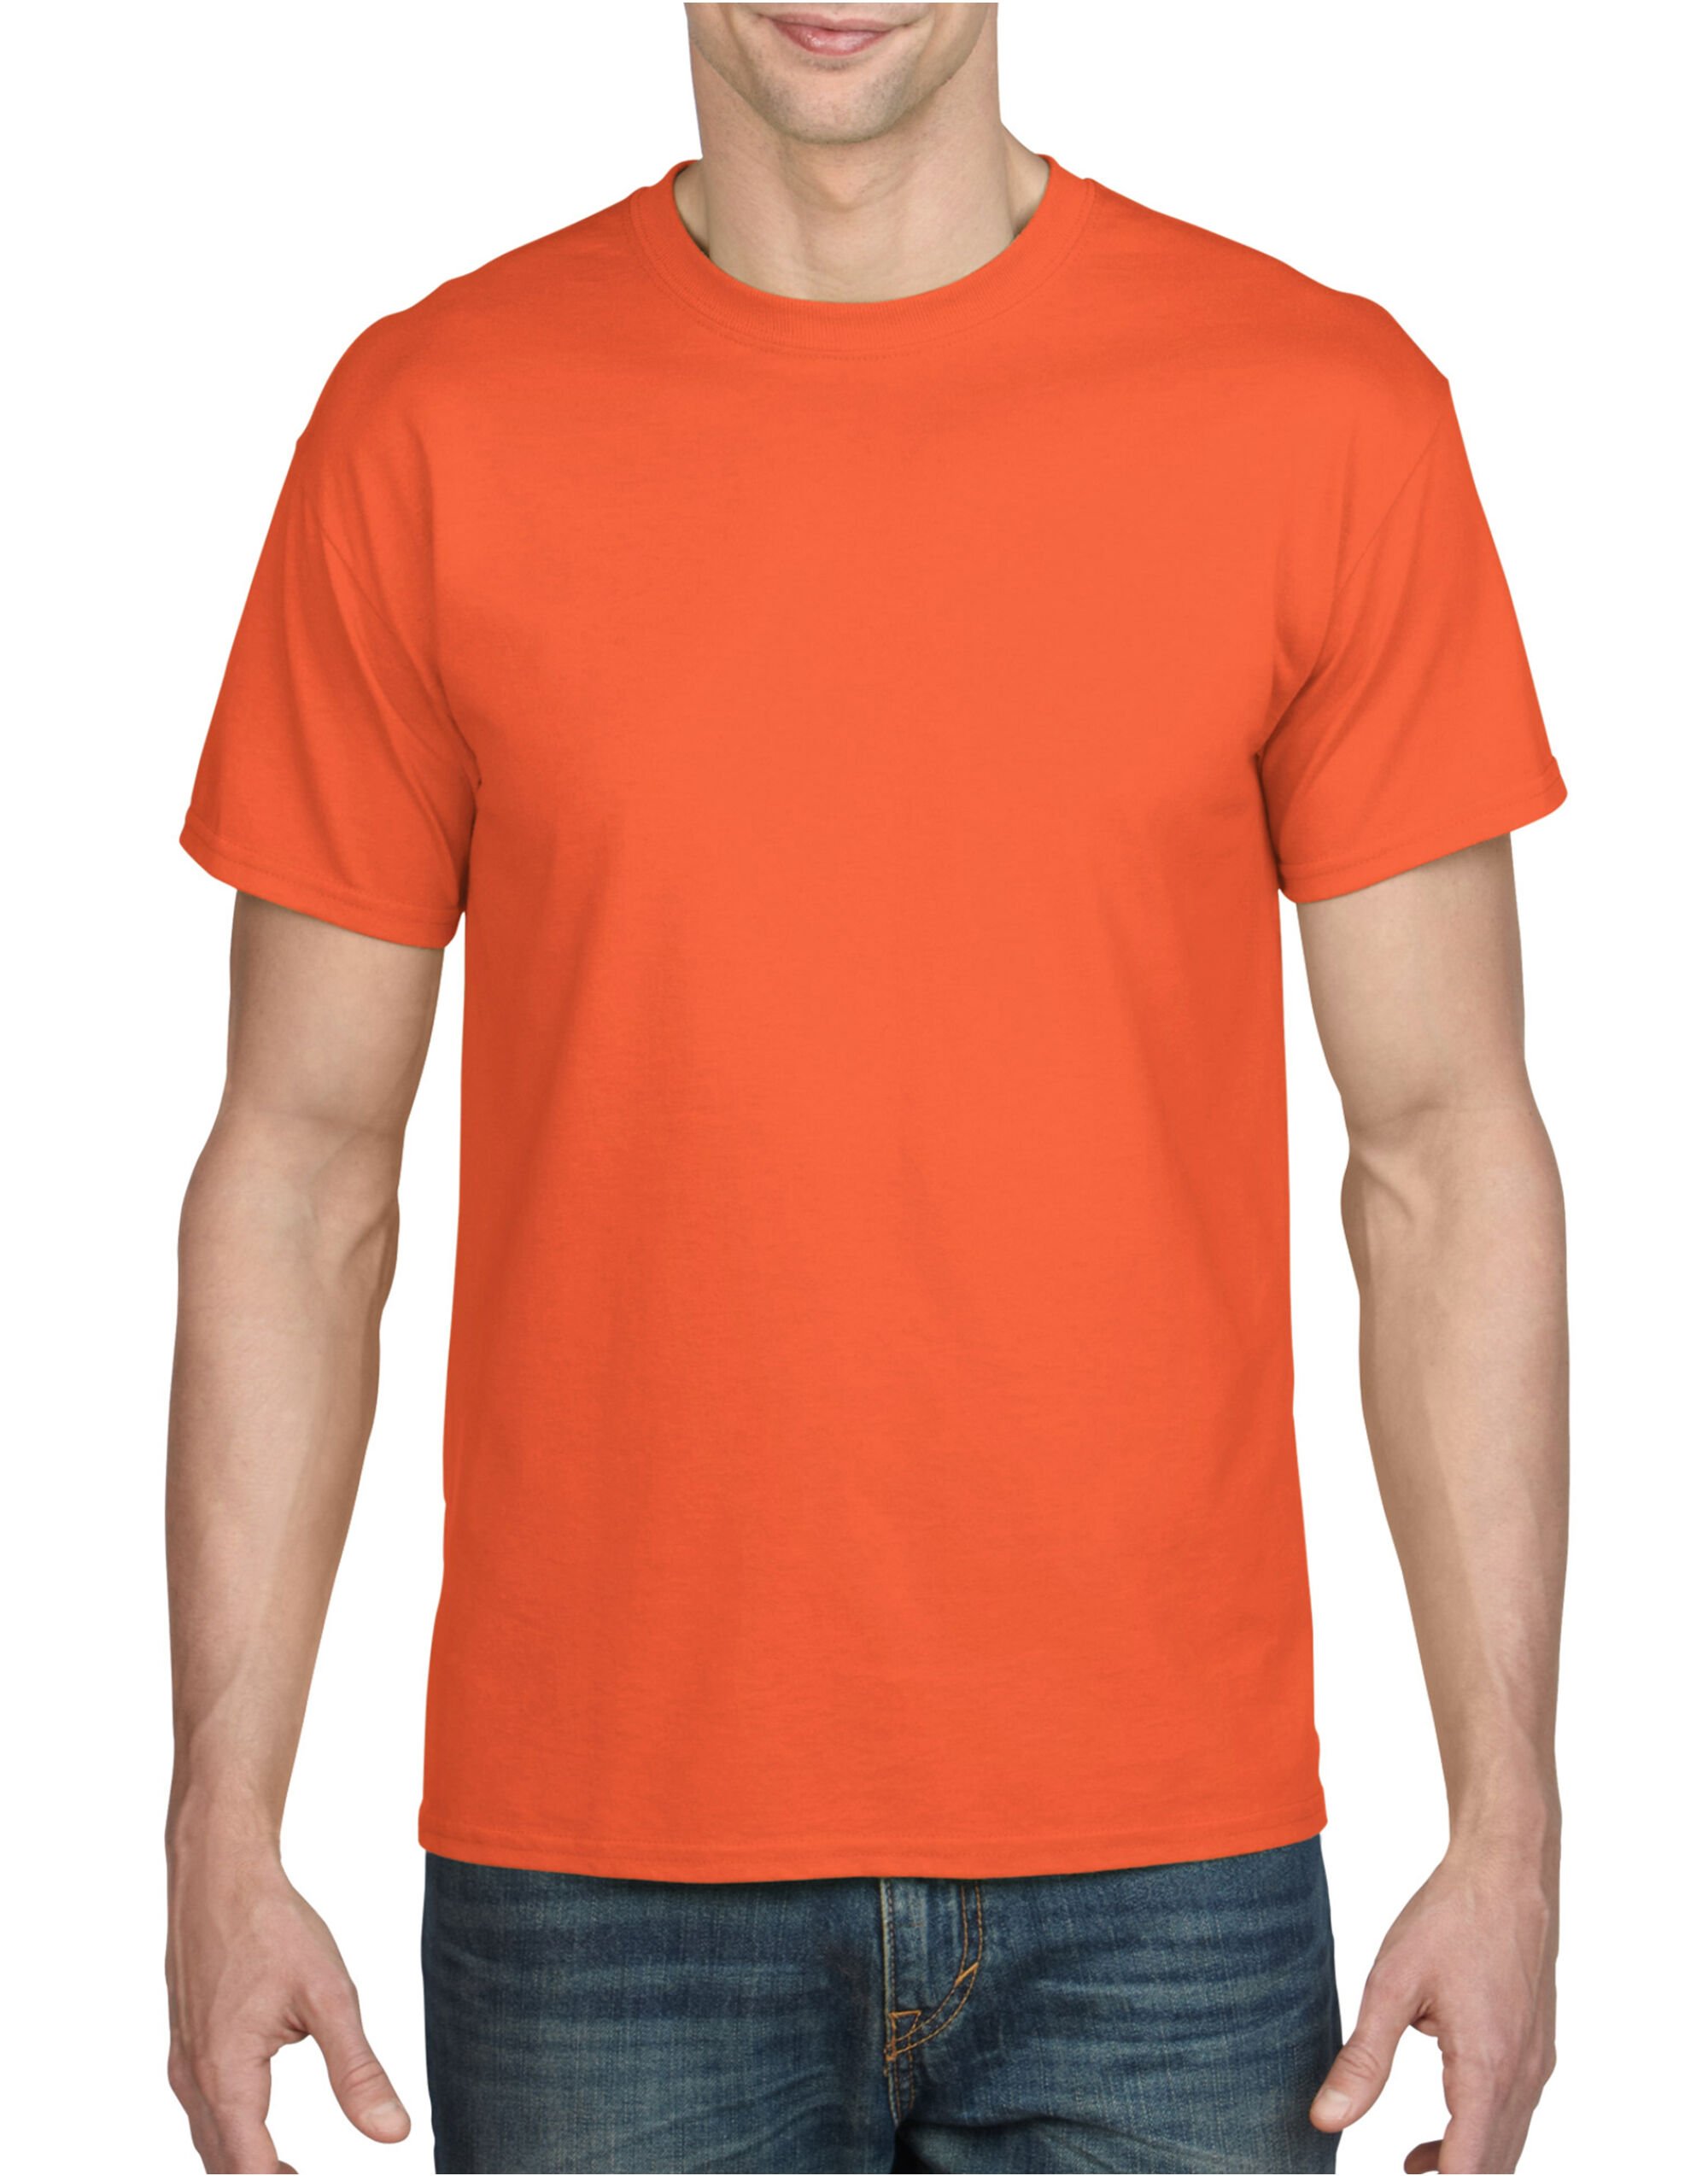 DryBlend Adult T-Shirt